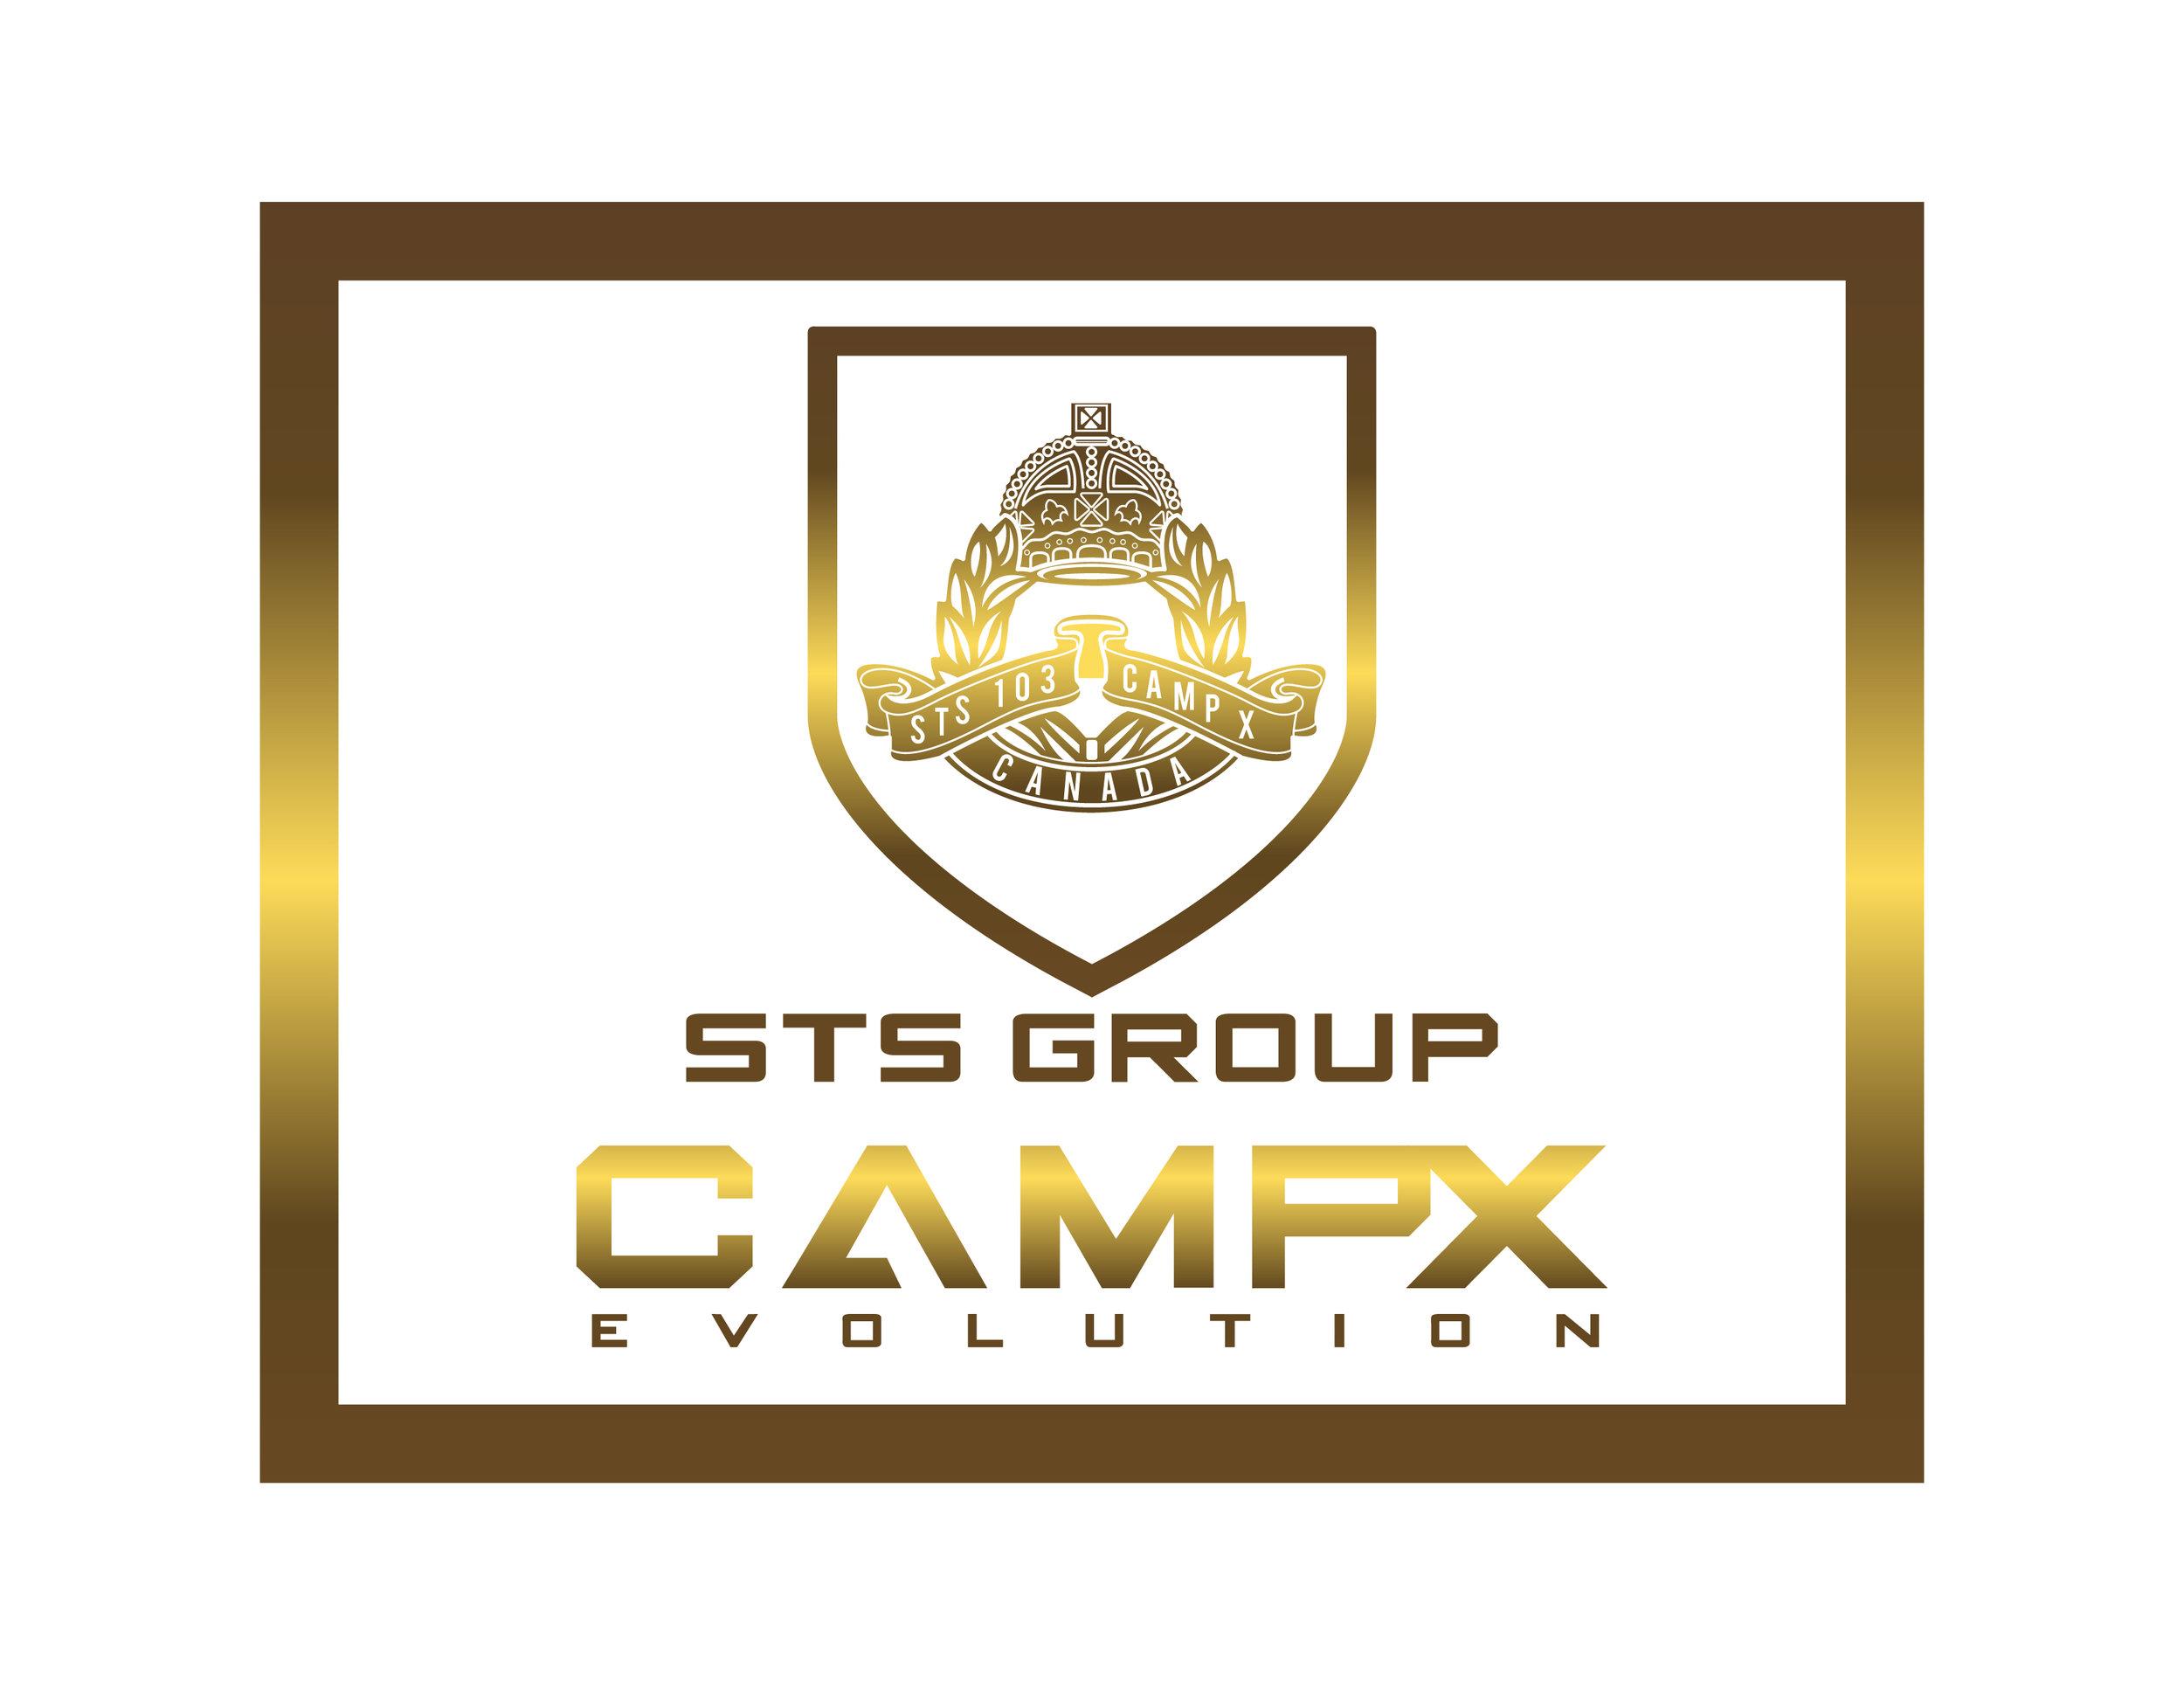 CampX_Evolution_LogoV3-02.jpg